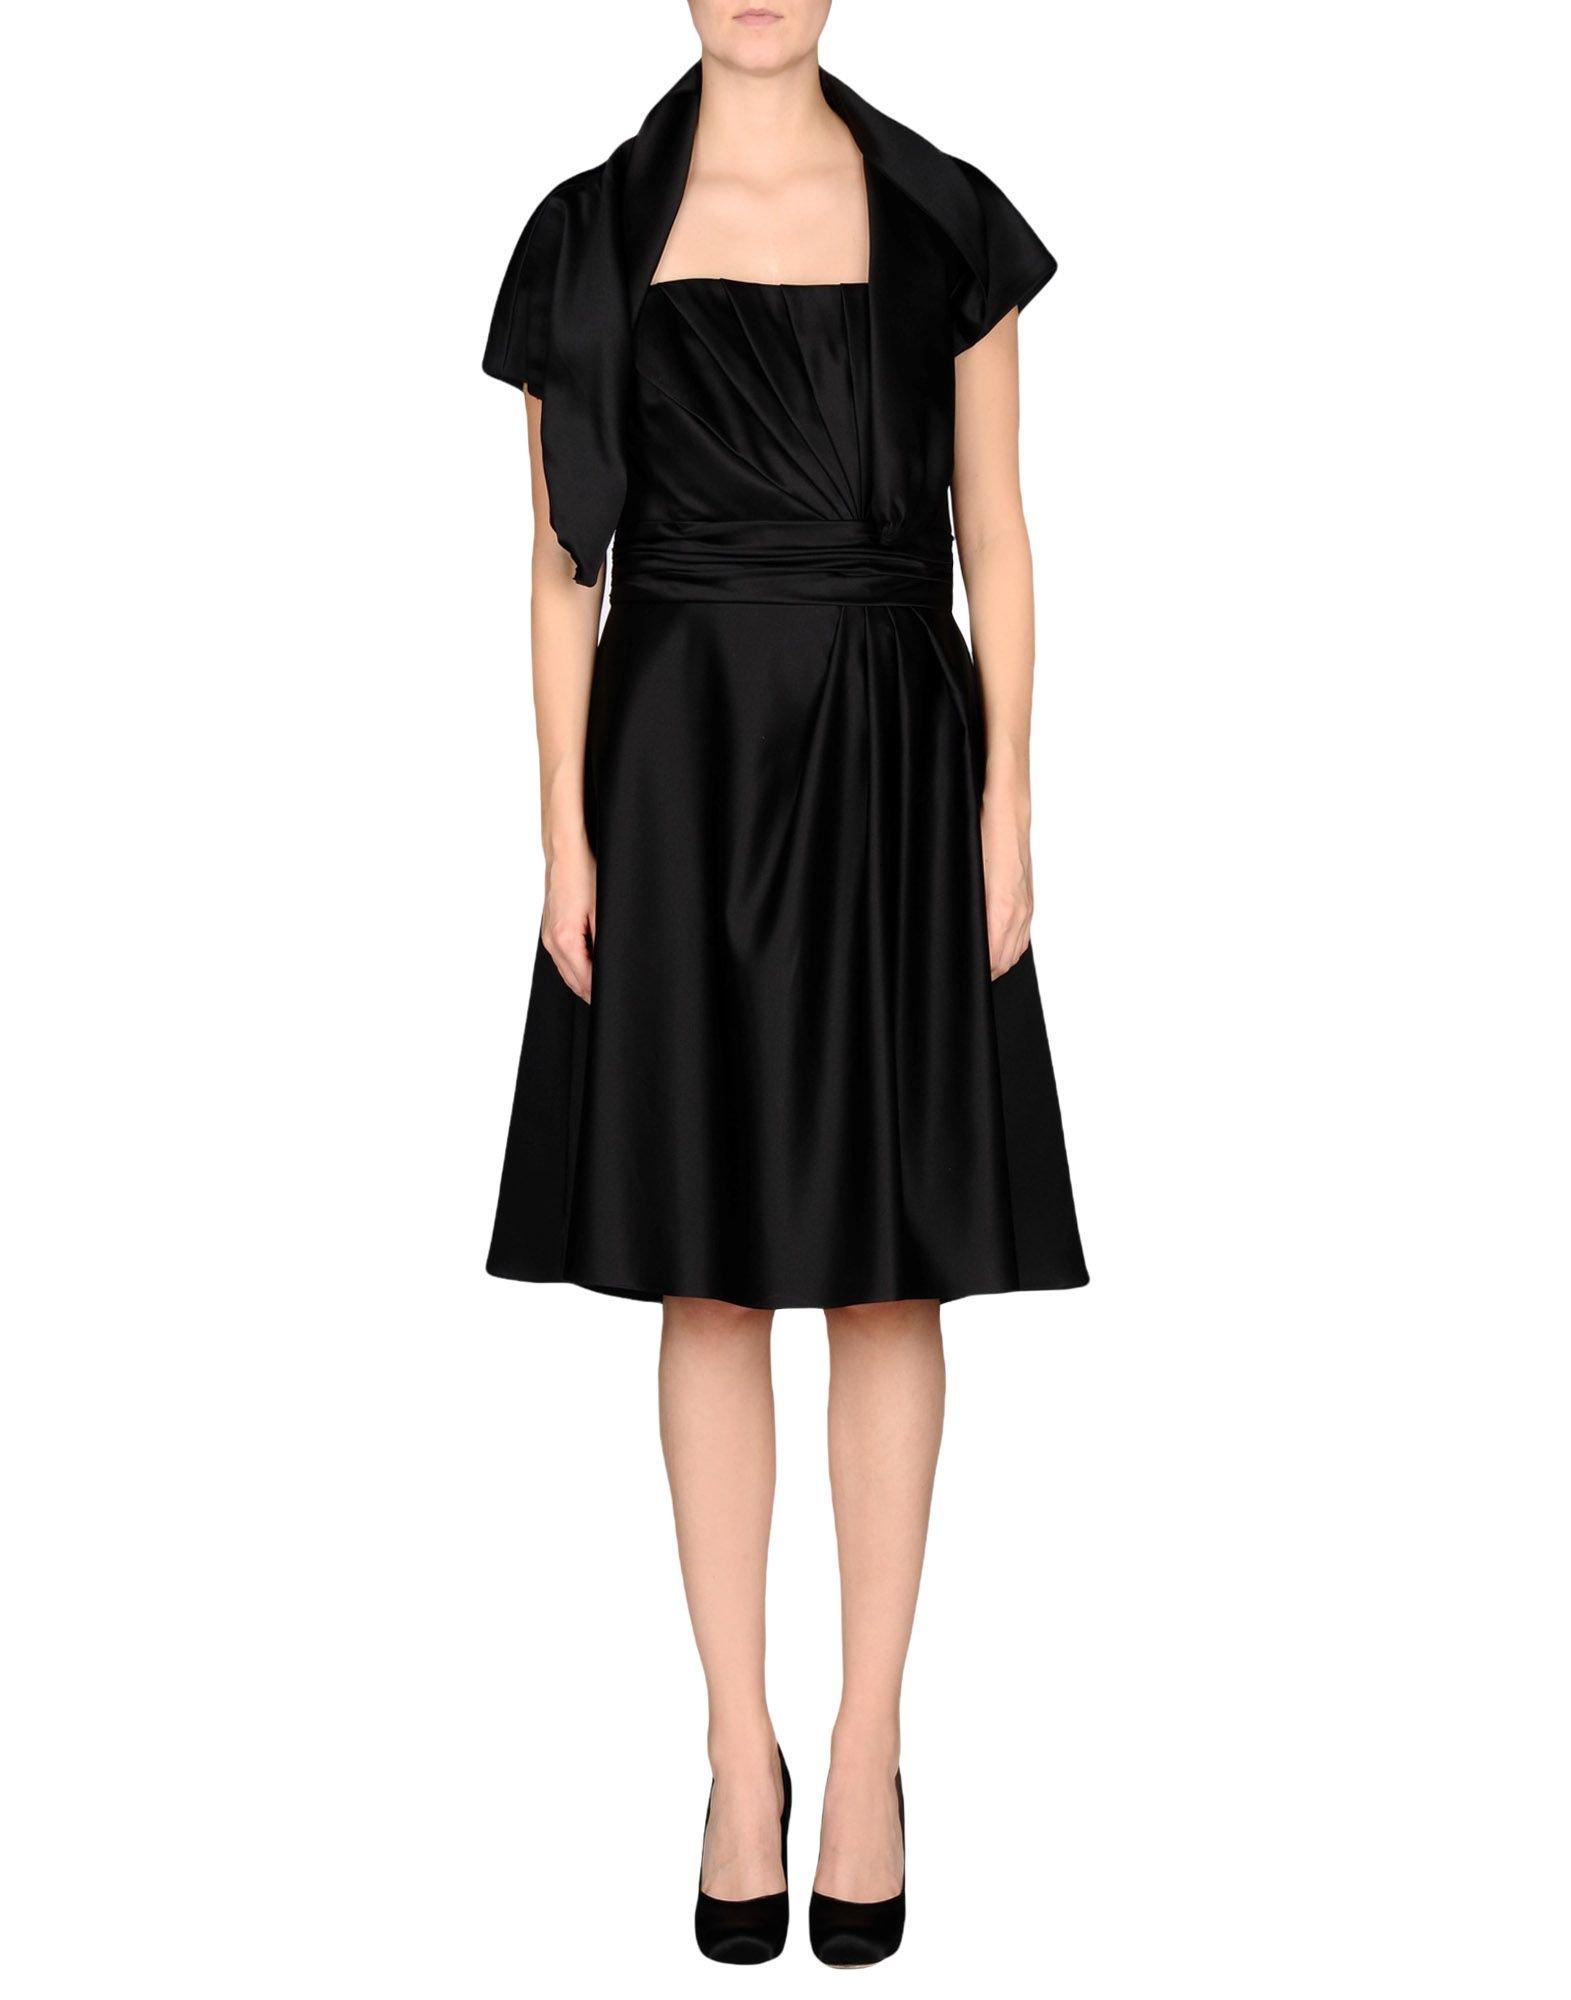 Carlo pignatelli Outfit in Black